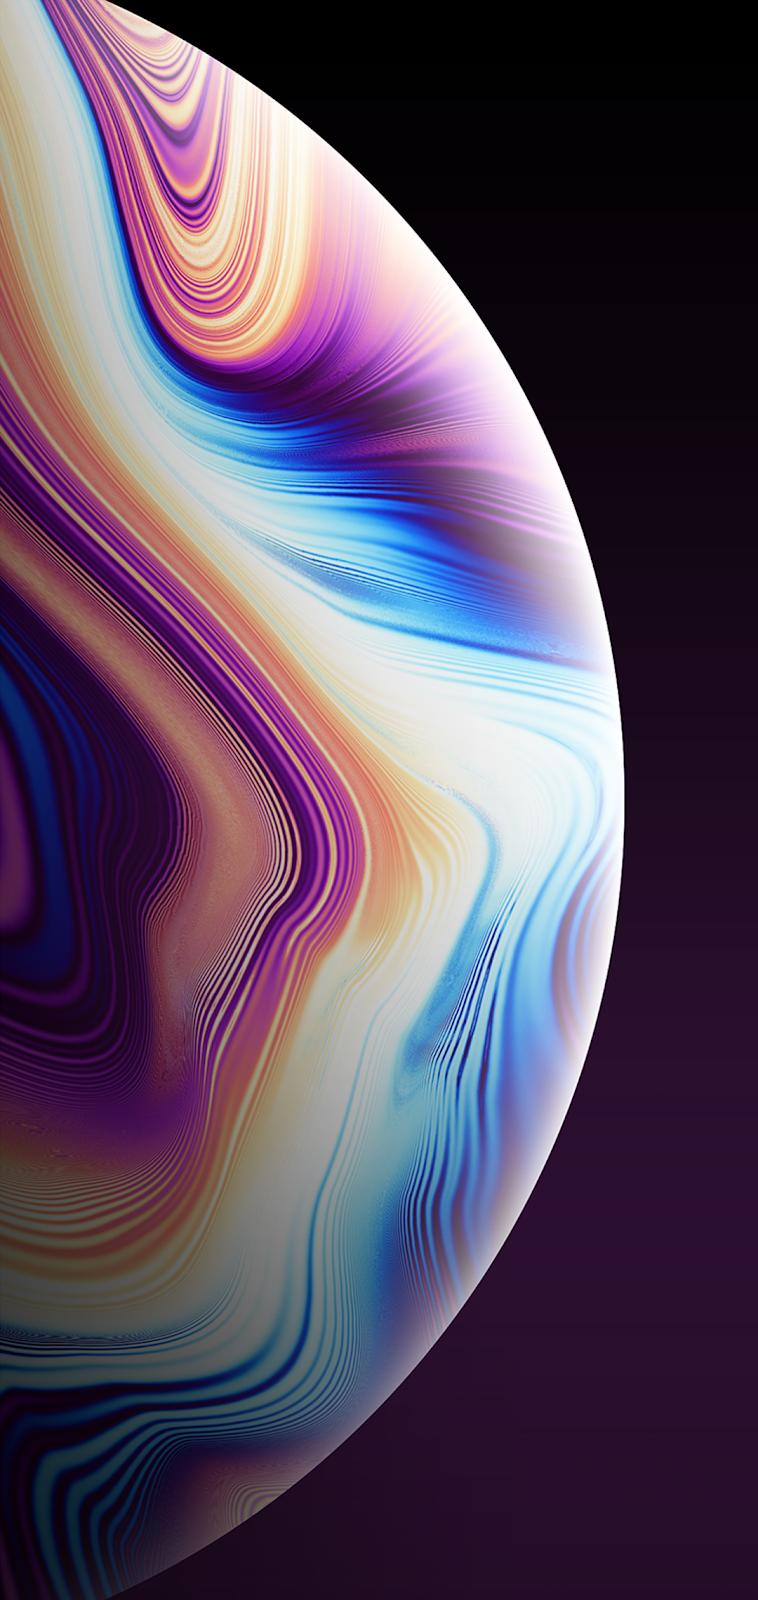 Colorful Bubble Iphone Wallpaper Ios Original Iphone Wallpaper Iphone Wallpaper Planets